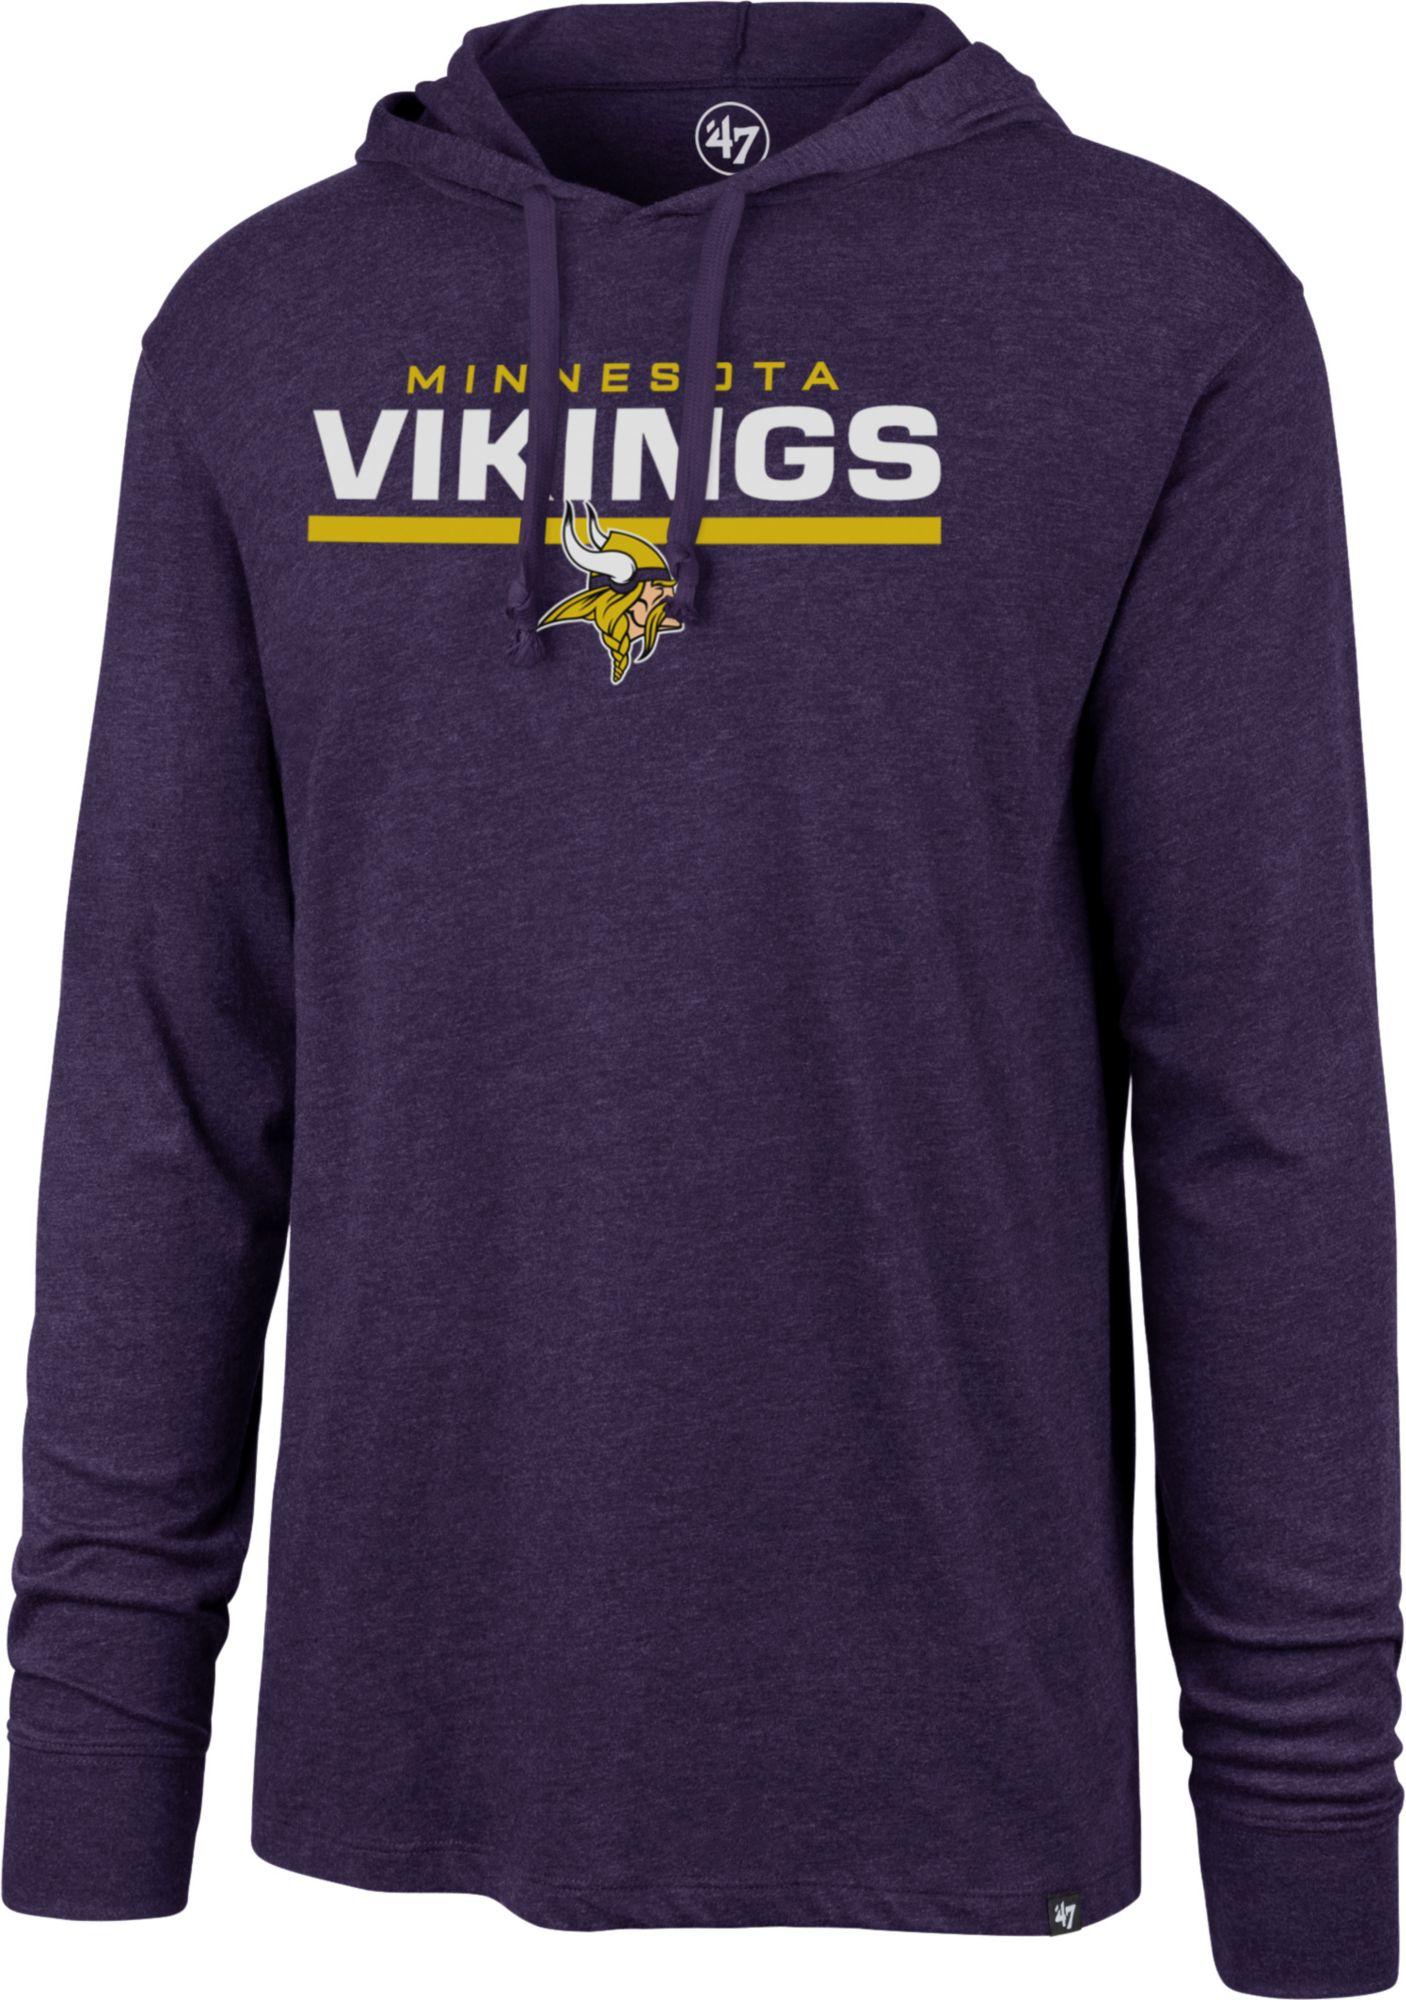 vikings fan shop coupon codes